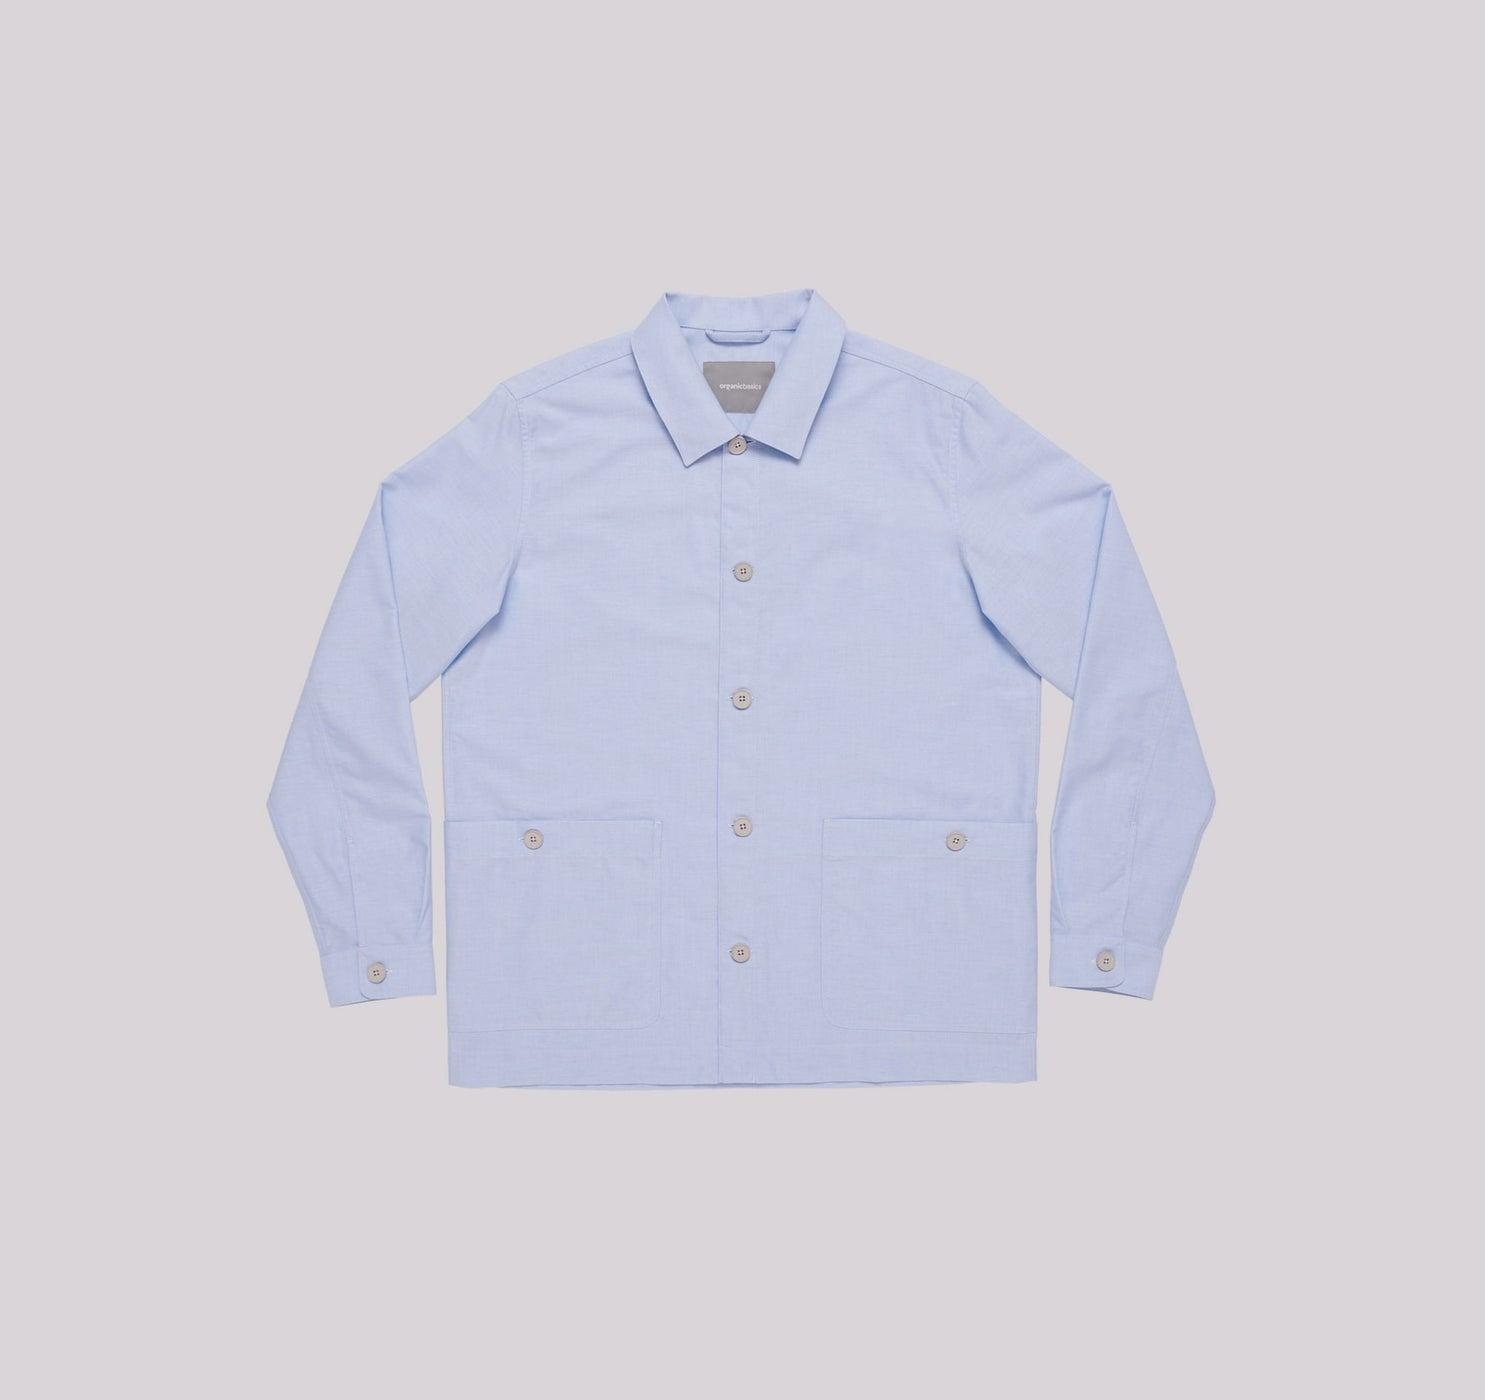 Organic Basics Organic Cotton Oxford Overshirt